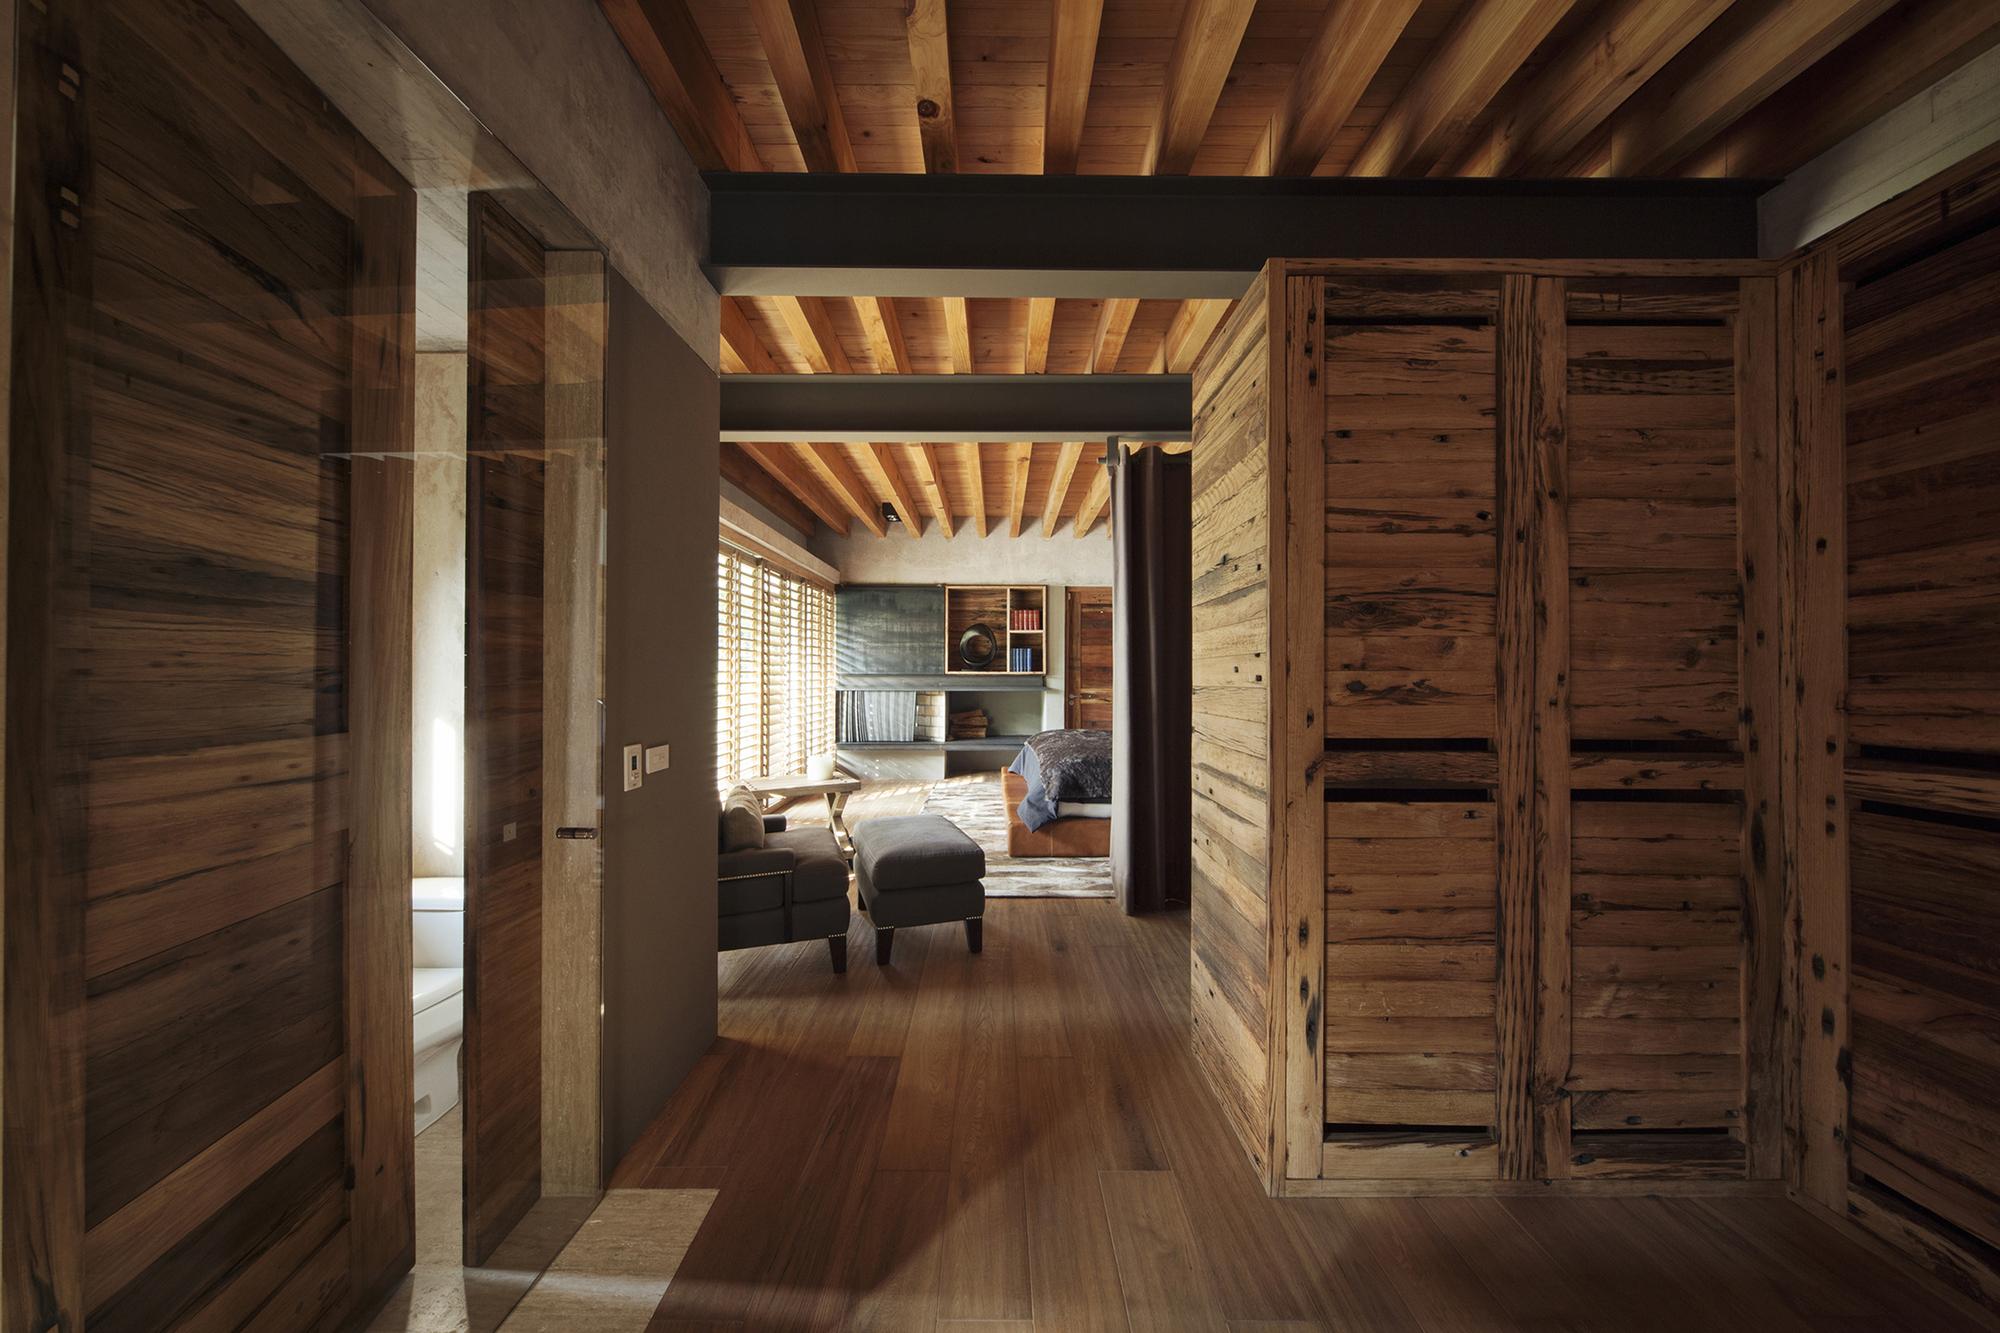 530eb5bac07a802c76000125_house-maza-chk-arquitectura_2014_02_18_mz_fotos_yoshihiro_2280px_ancho_-13-